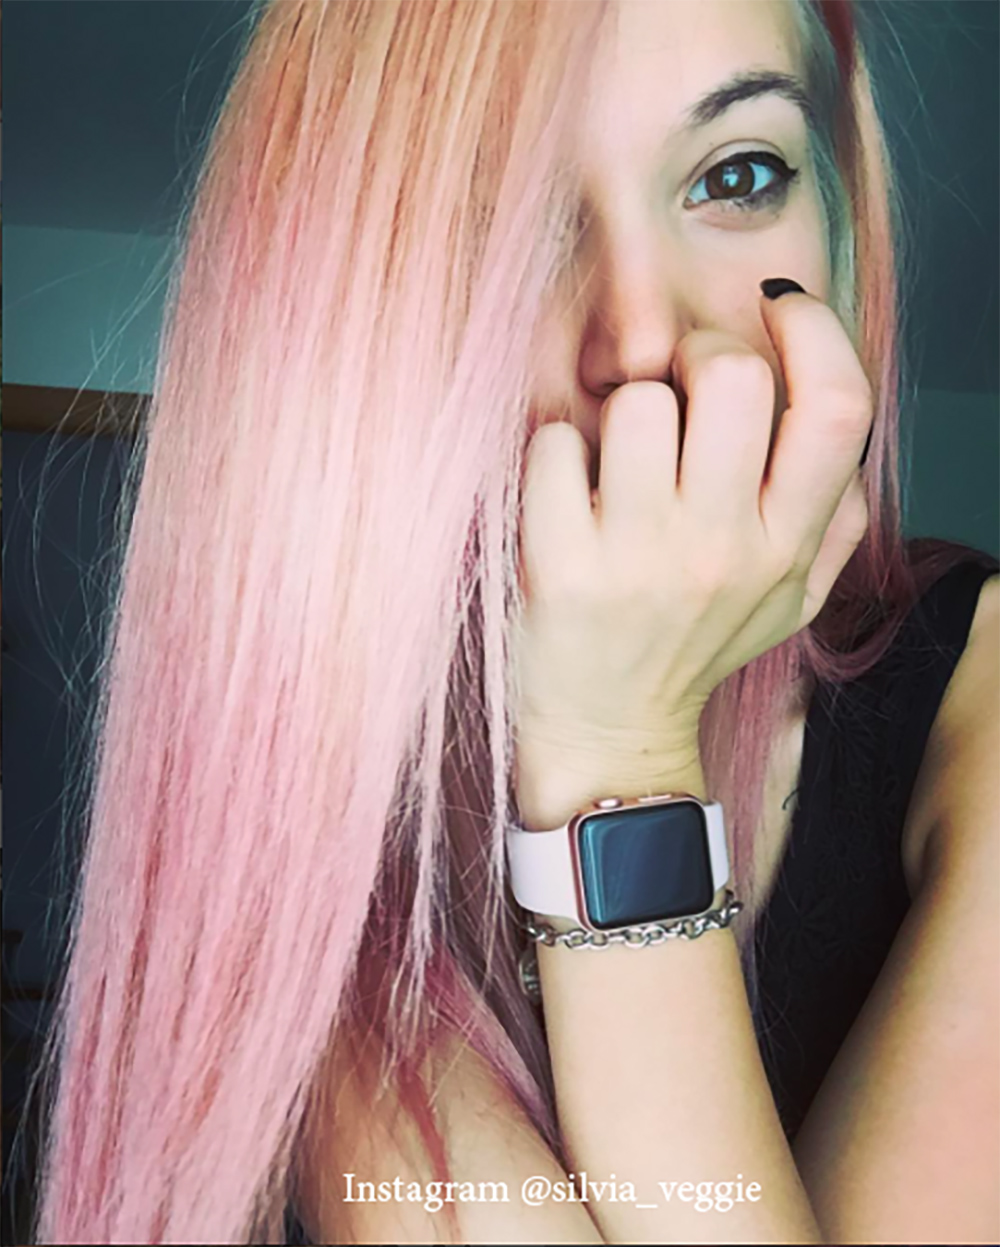 10. Цвет волос - розовое дерево